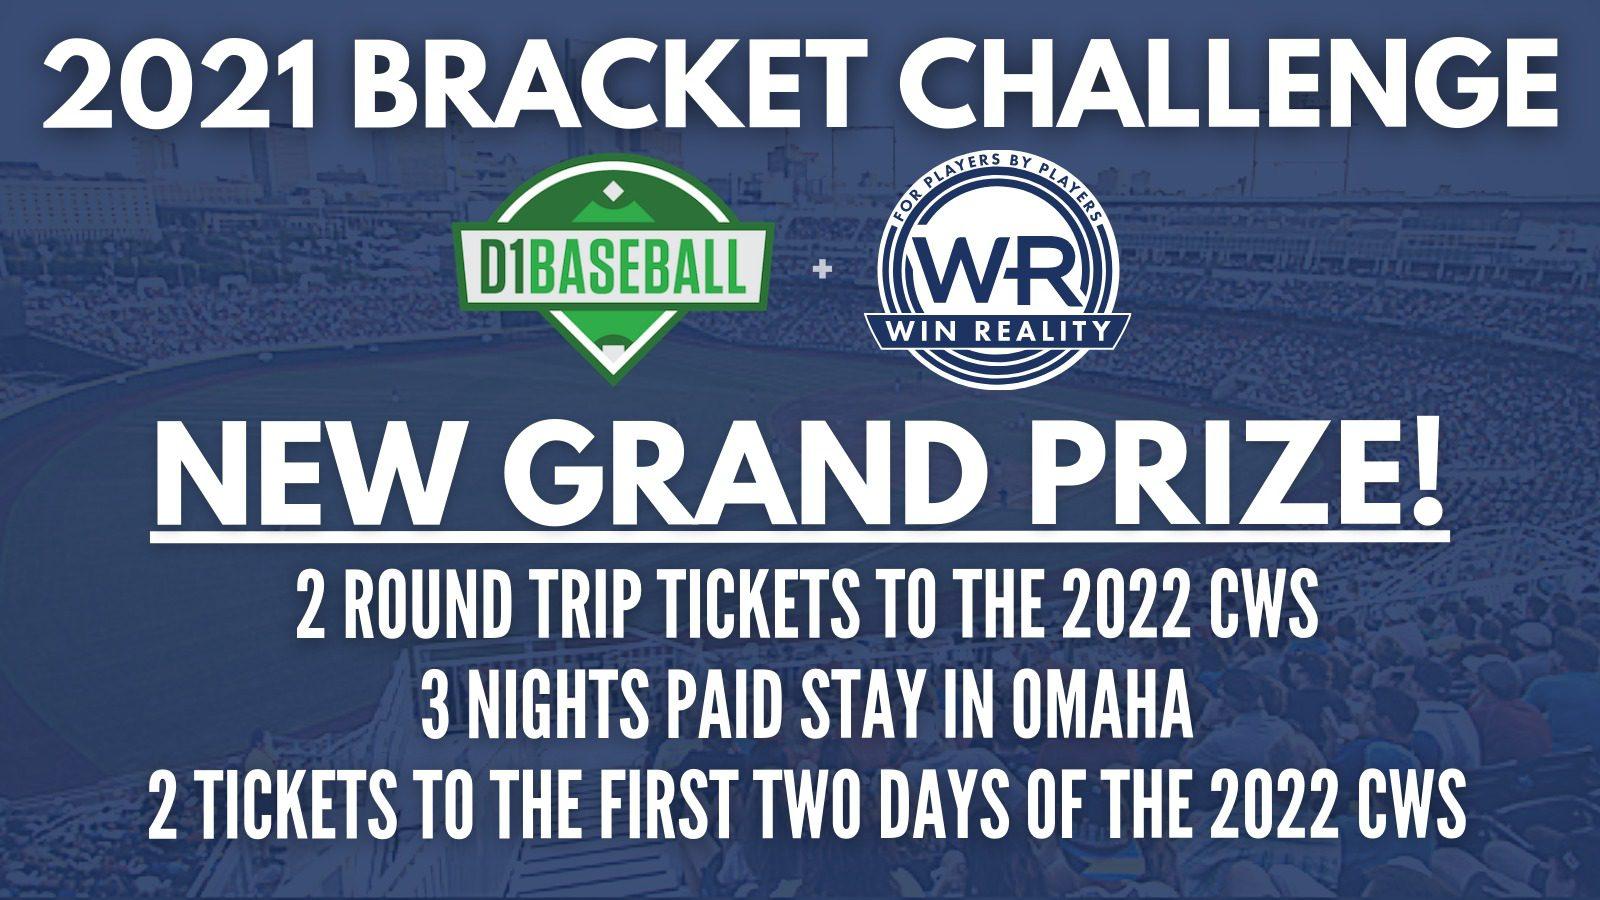 Bracket Challenge Grand Prize